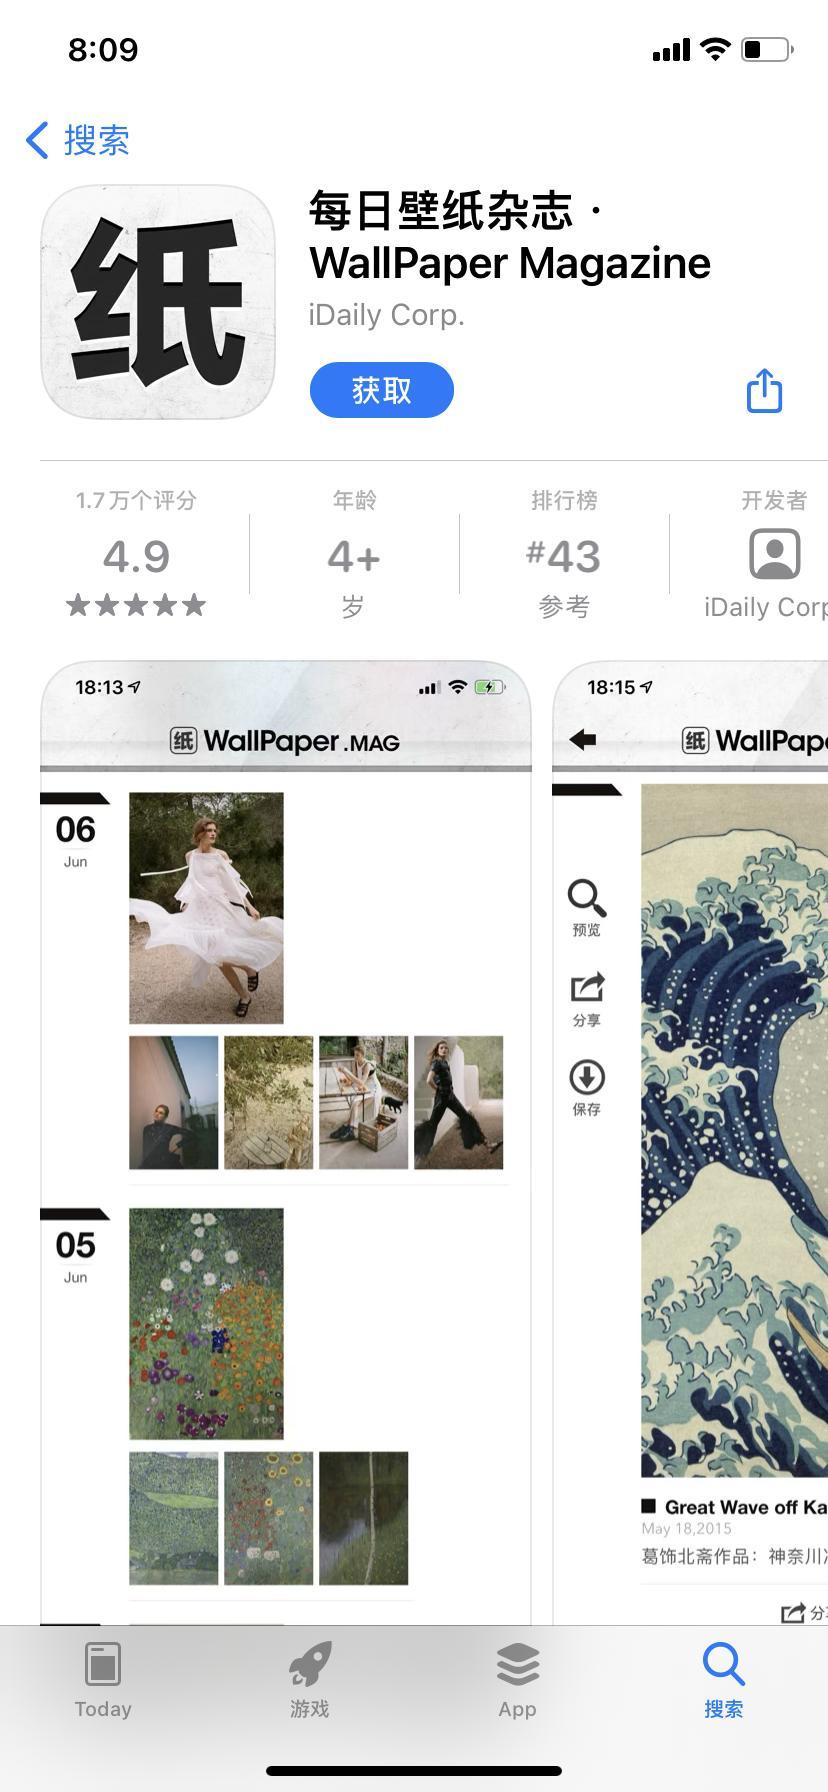 wallpaper是什么(wallpaper的中文意思)